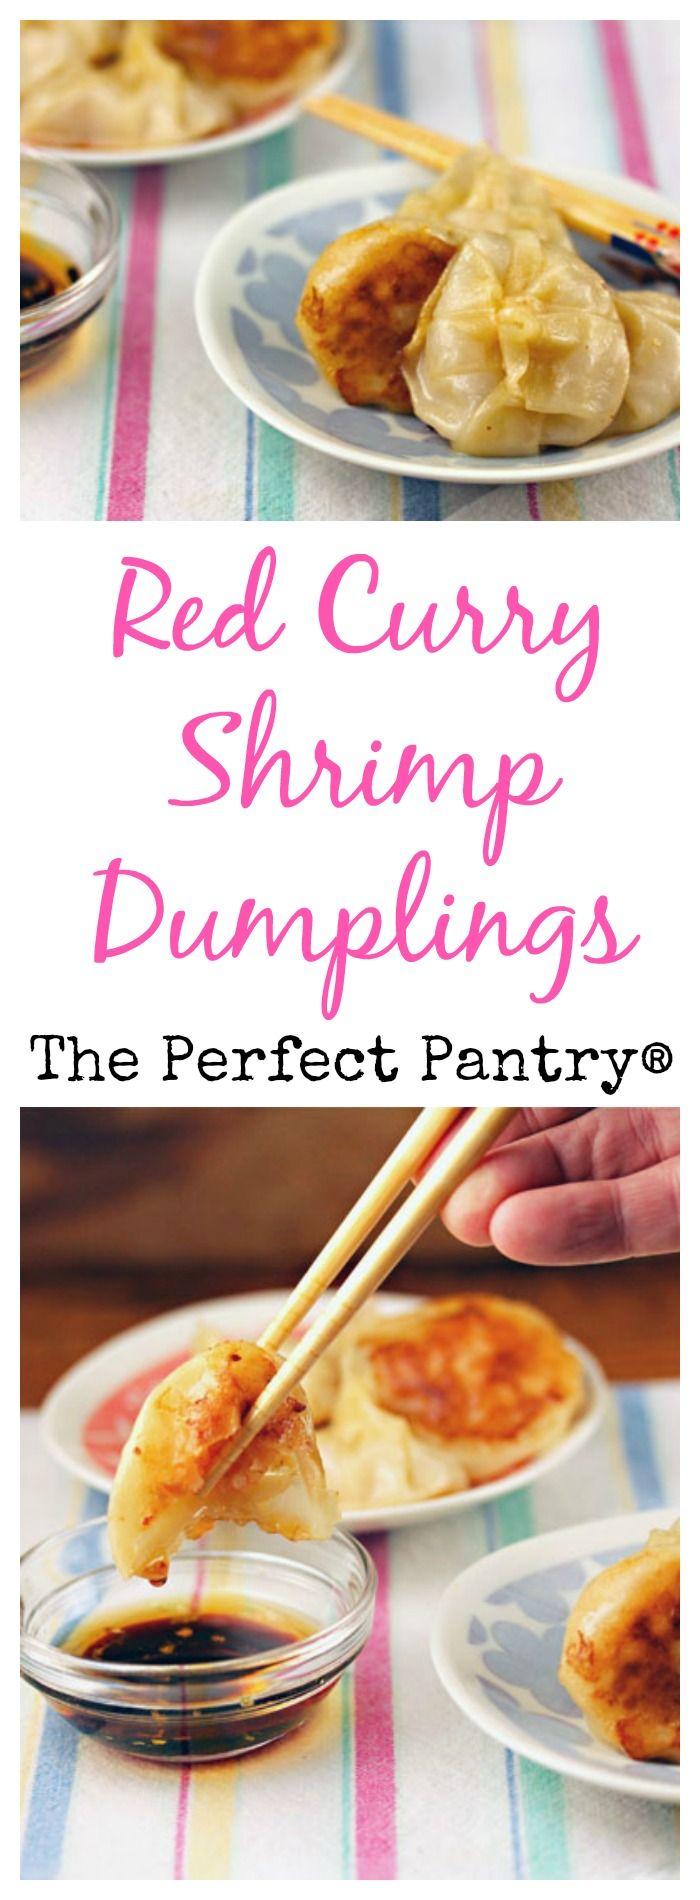 about #Healthy Shrimp Recipes on Pinterest | Grilled shrimp, Shrimp ...